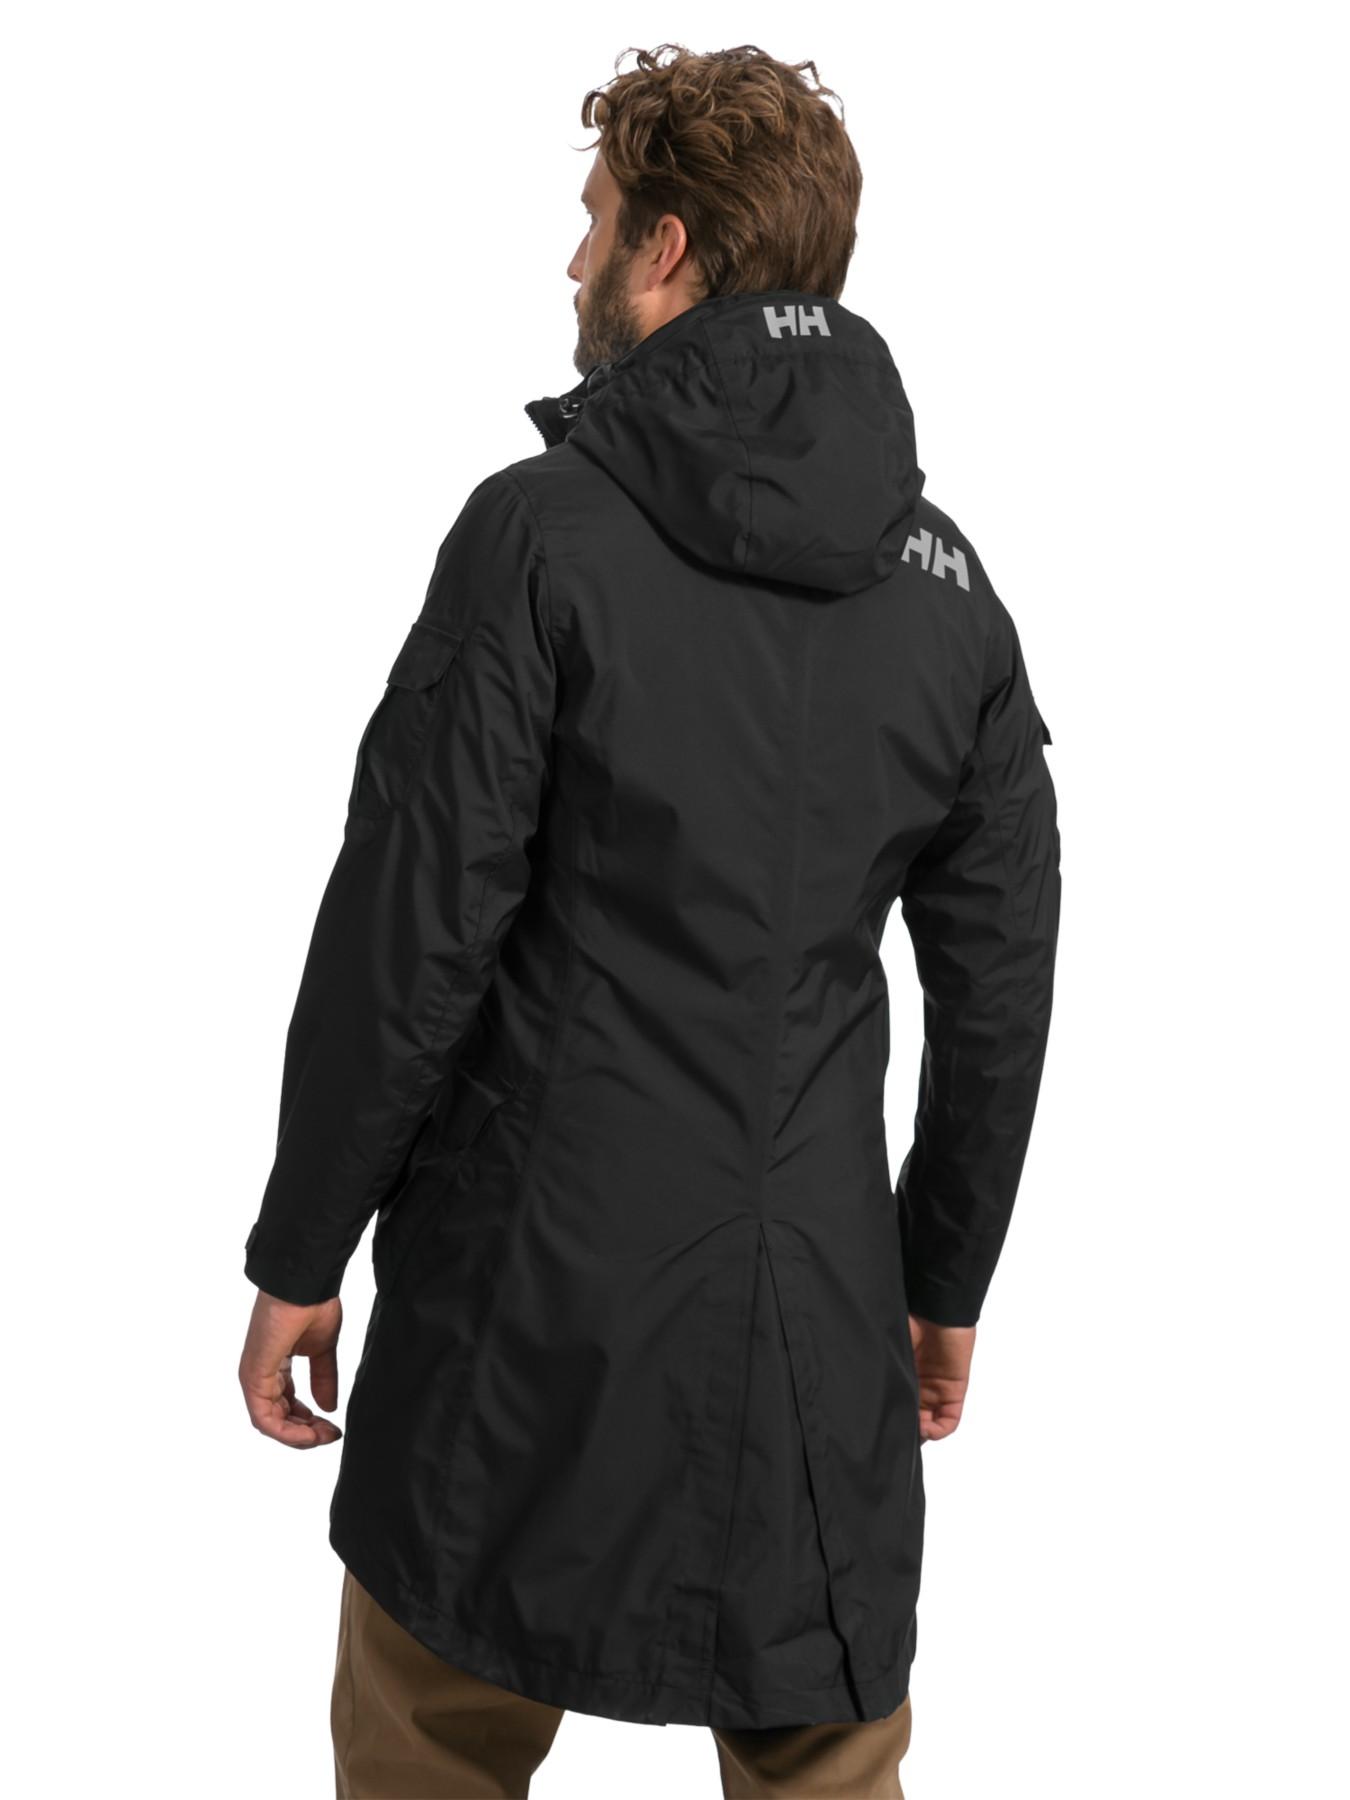 Helly Hansen Hydropower Rigging Coat In Black For Men Lyst